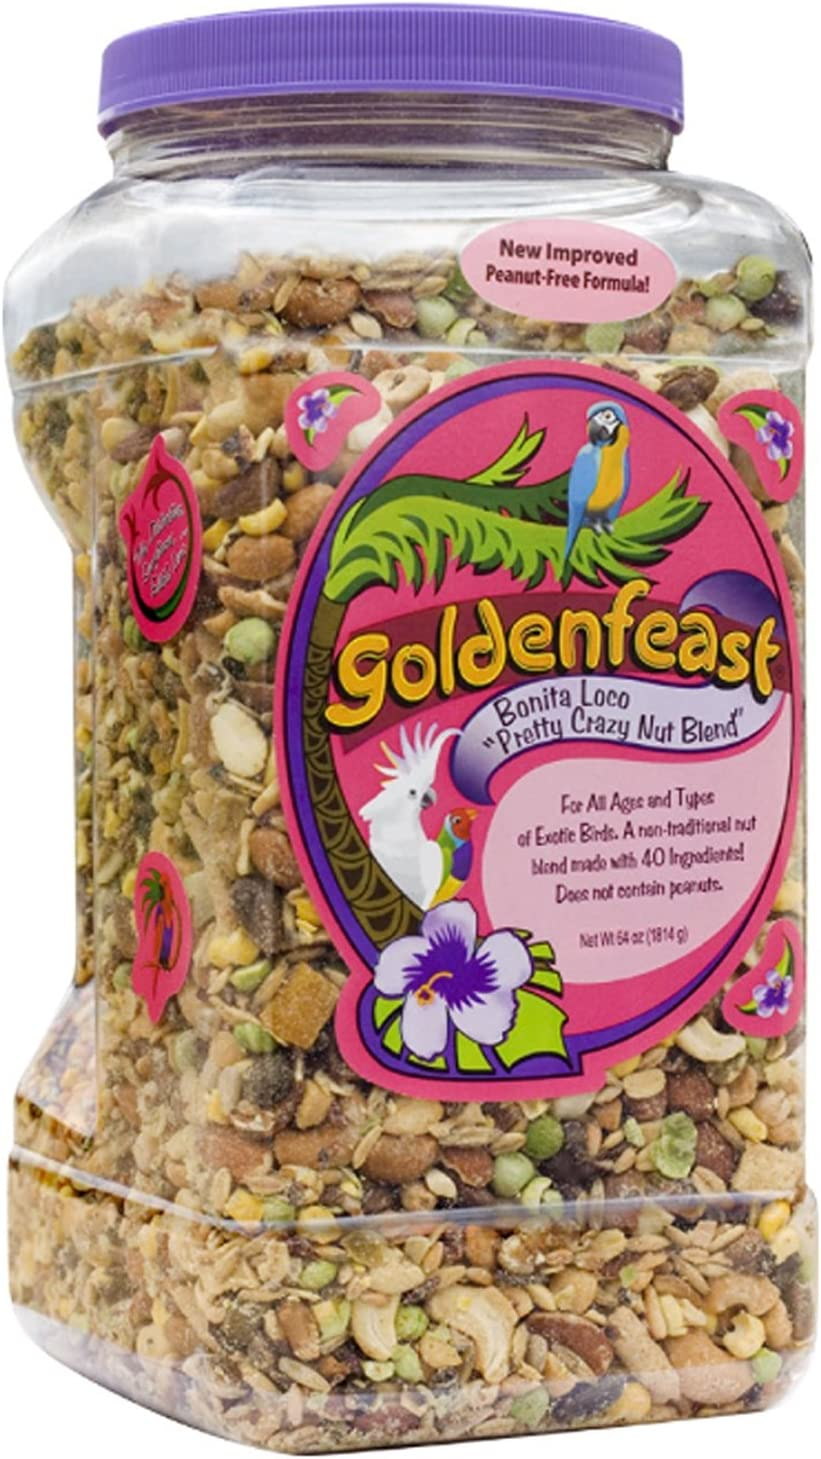 Goldenfeast Bonita Loco Bird Food, 64 oz.